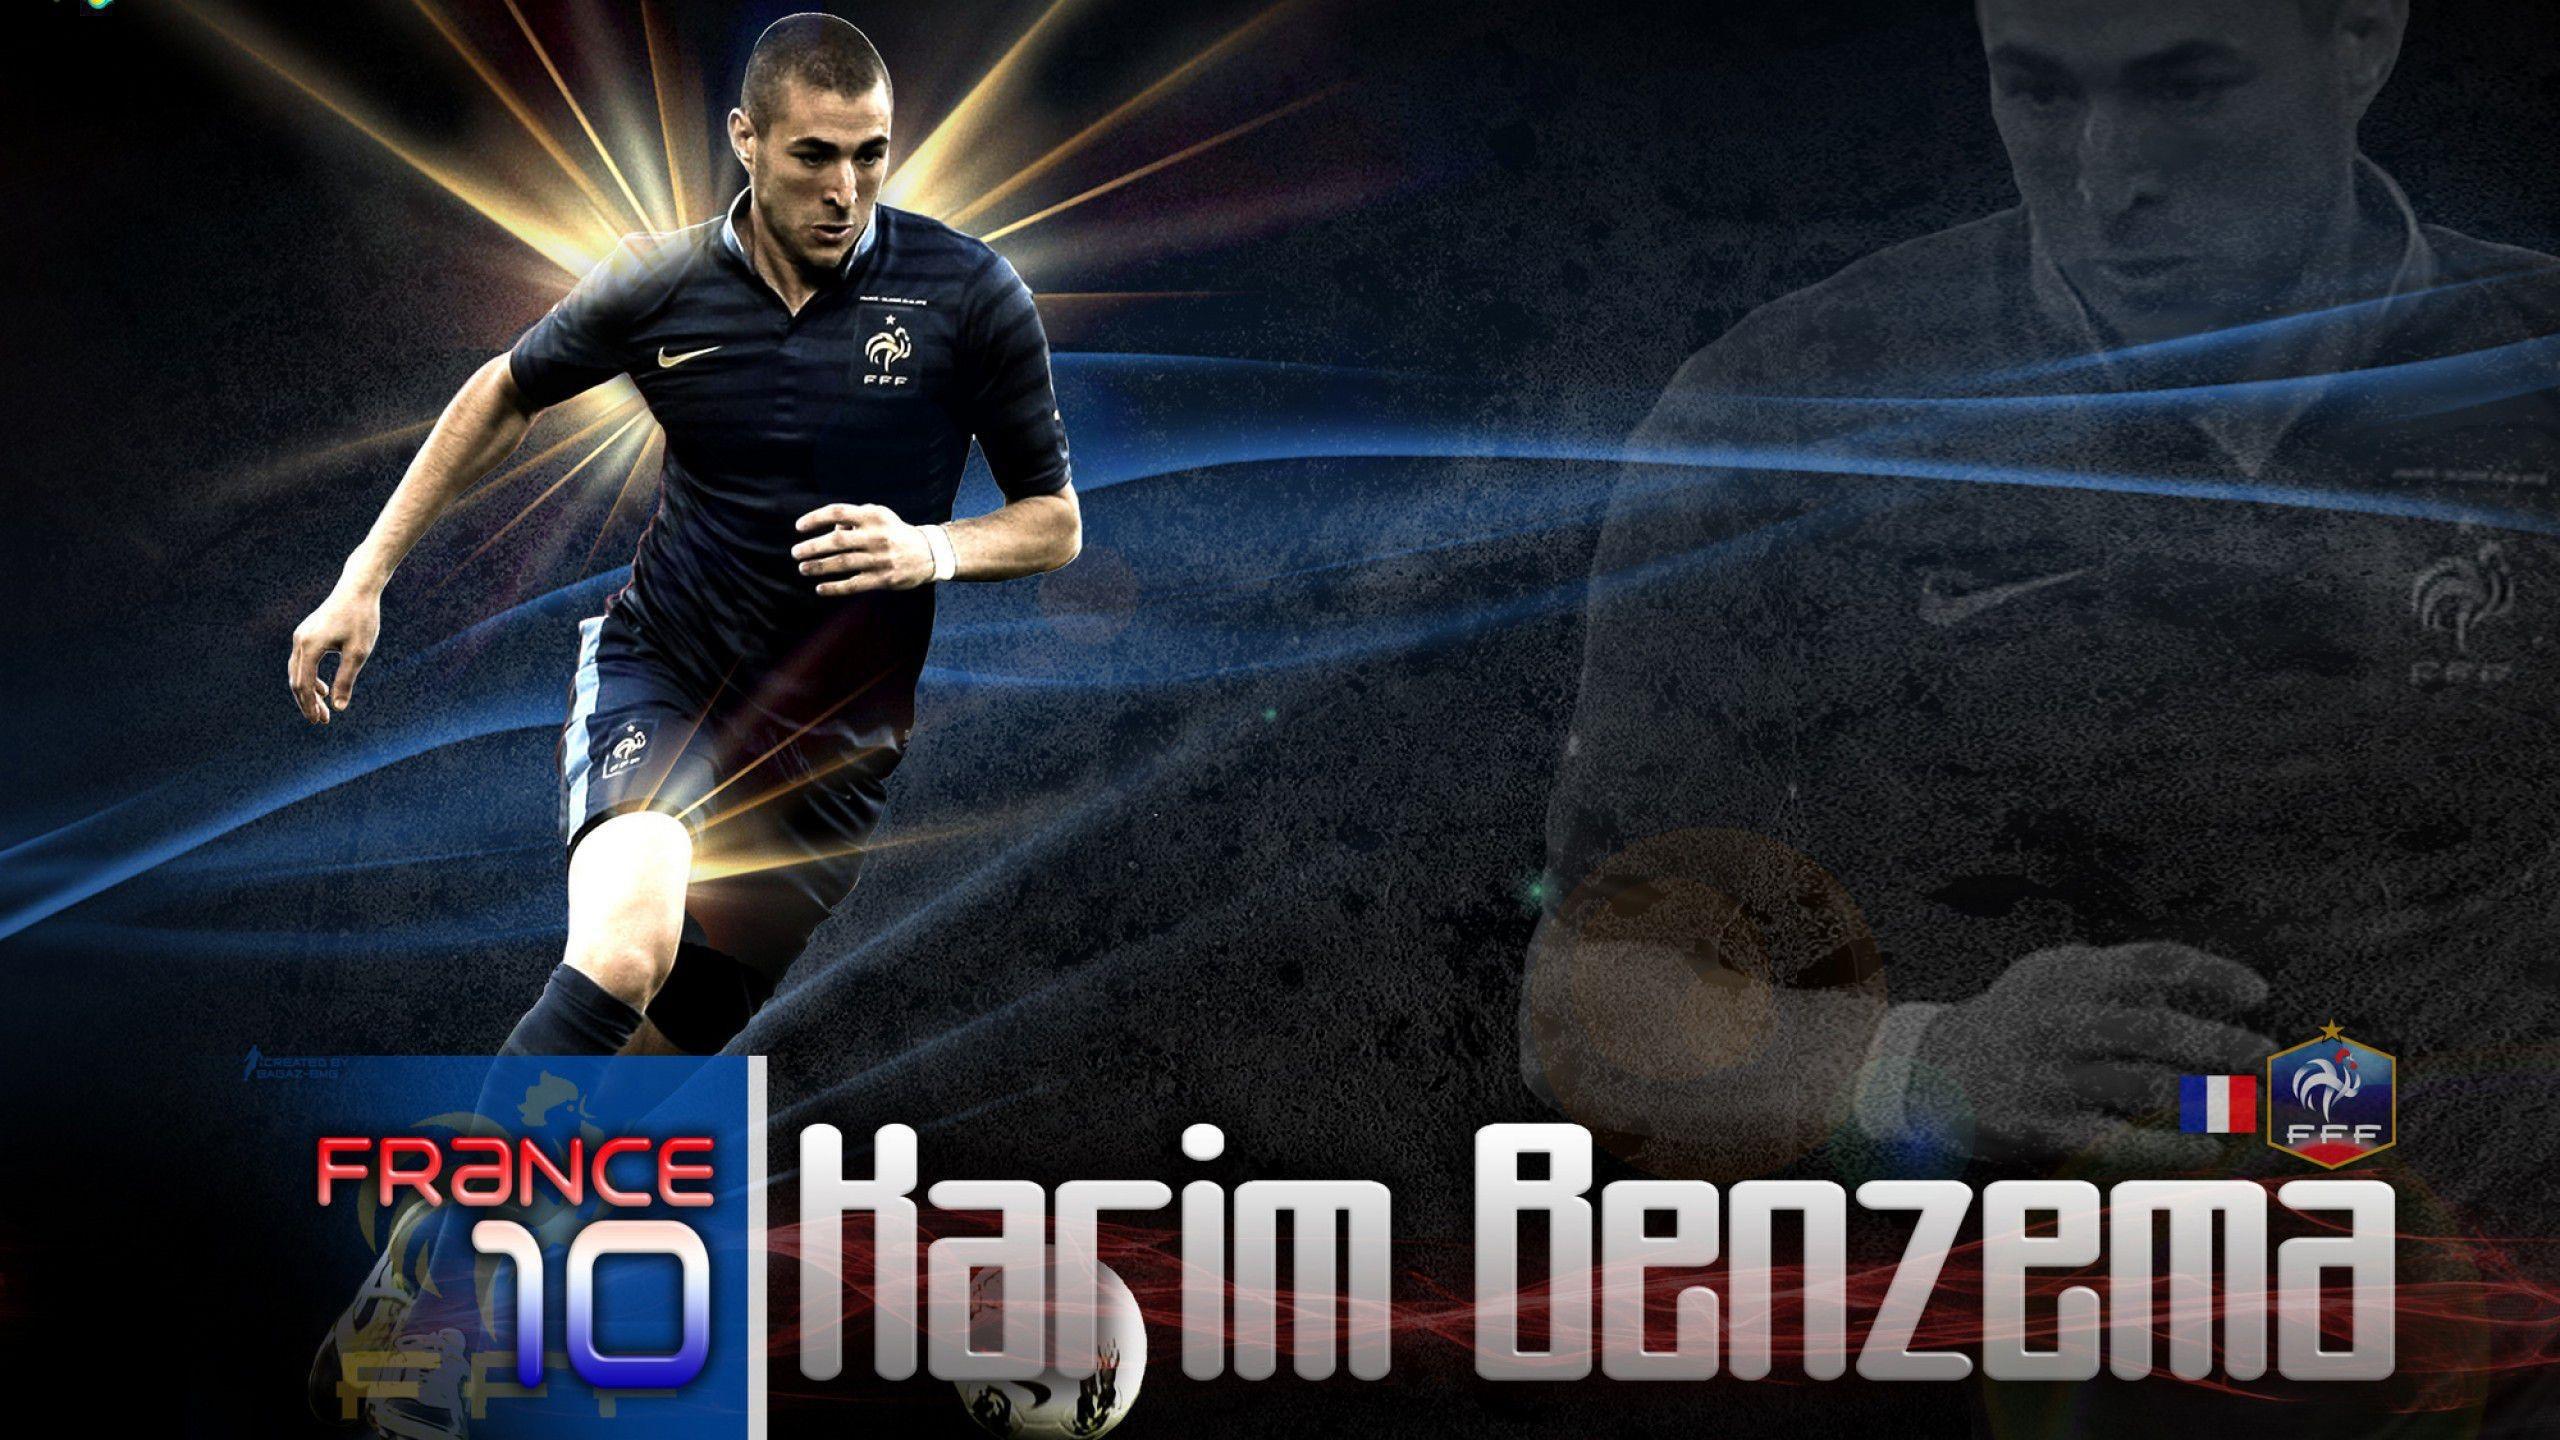 Karim Benzema Desktop Wallpapers